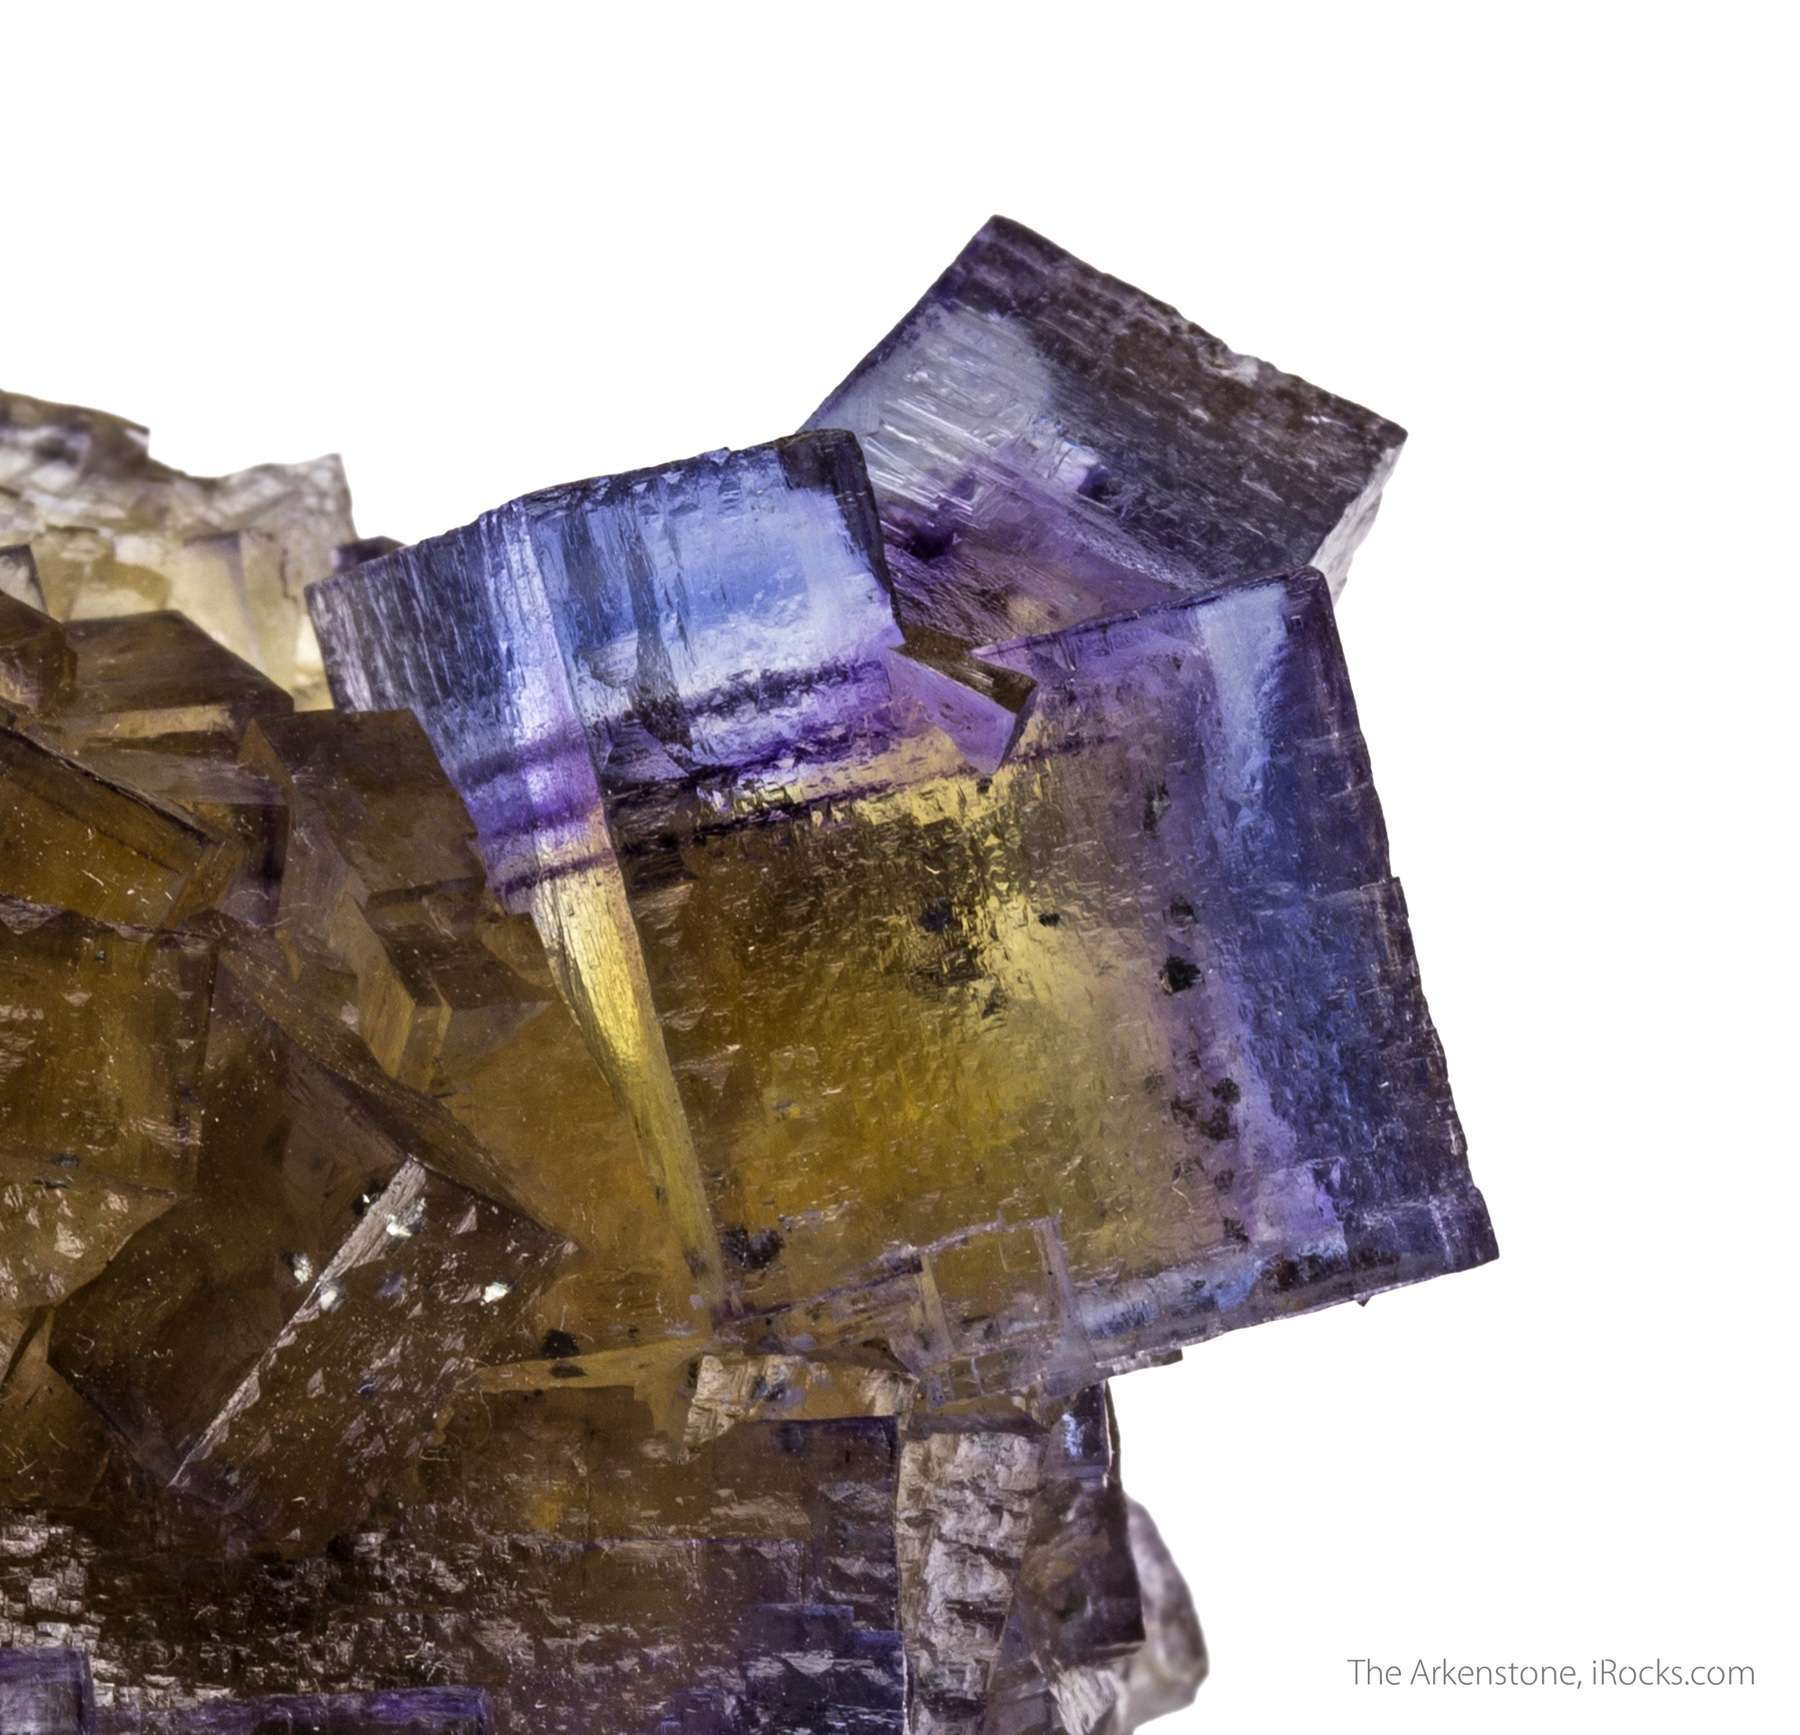 This fine fluorite specimen highlighted rare penetration twinning